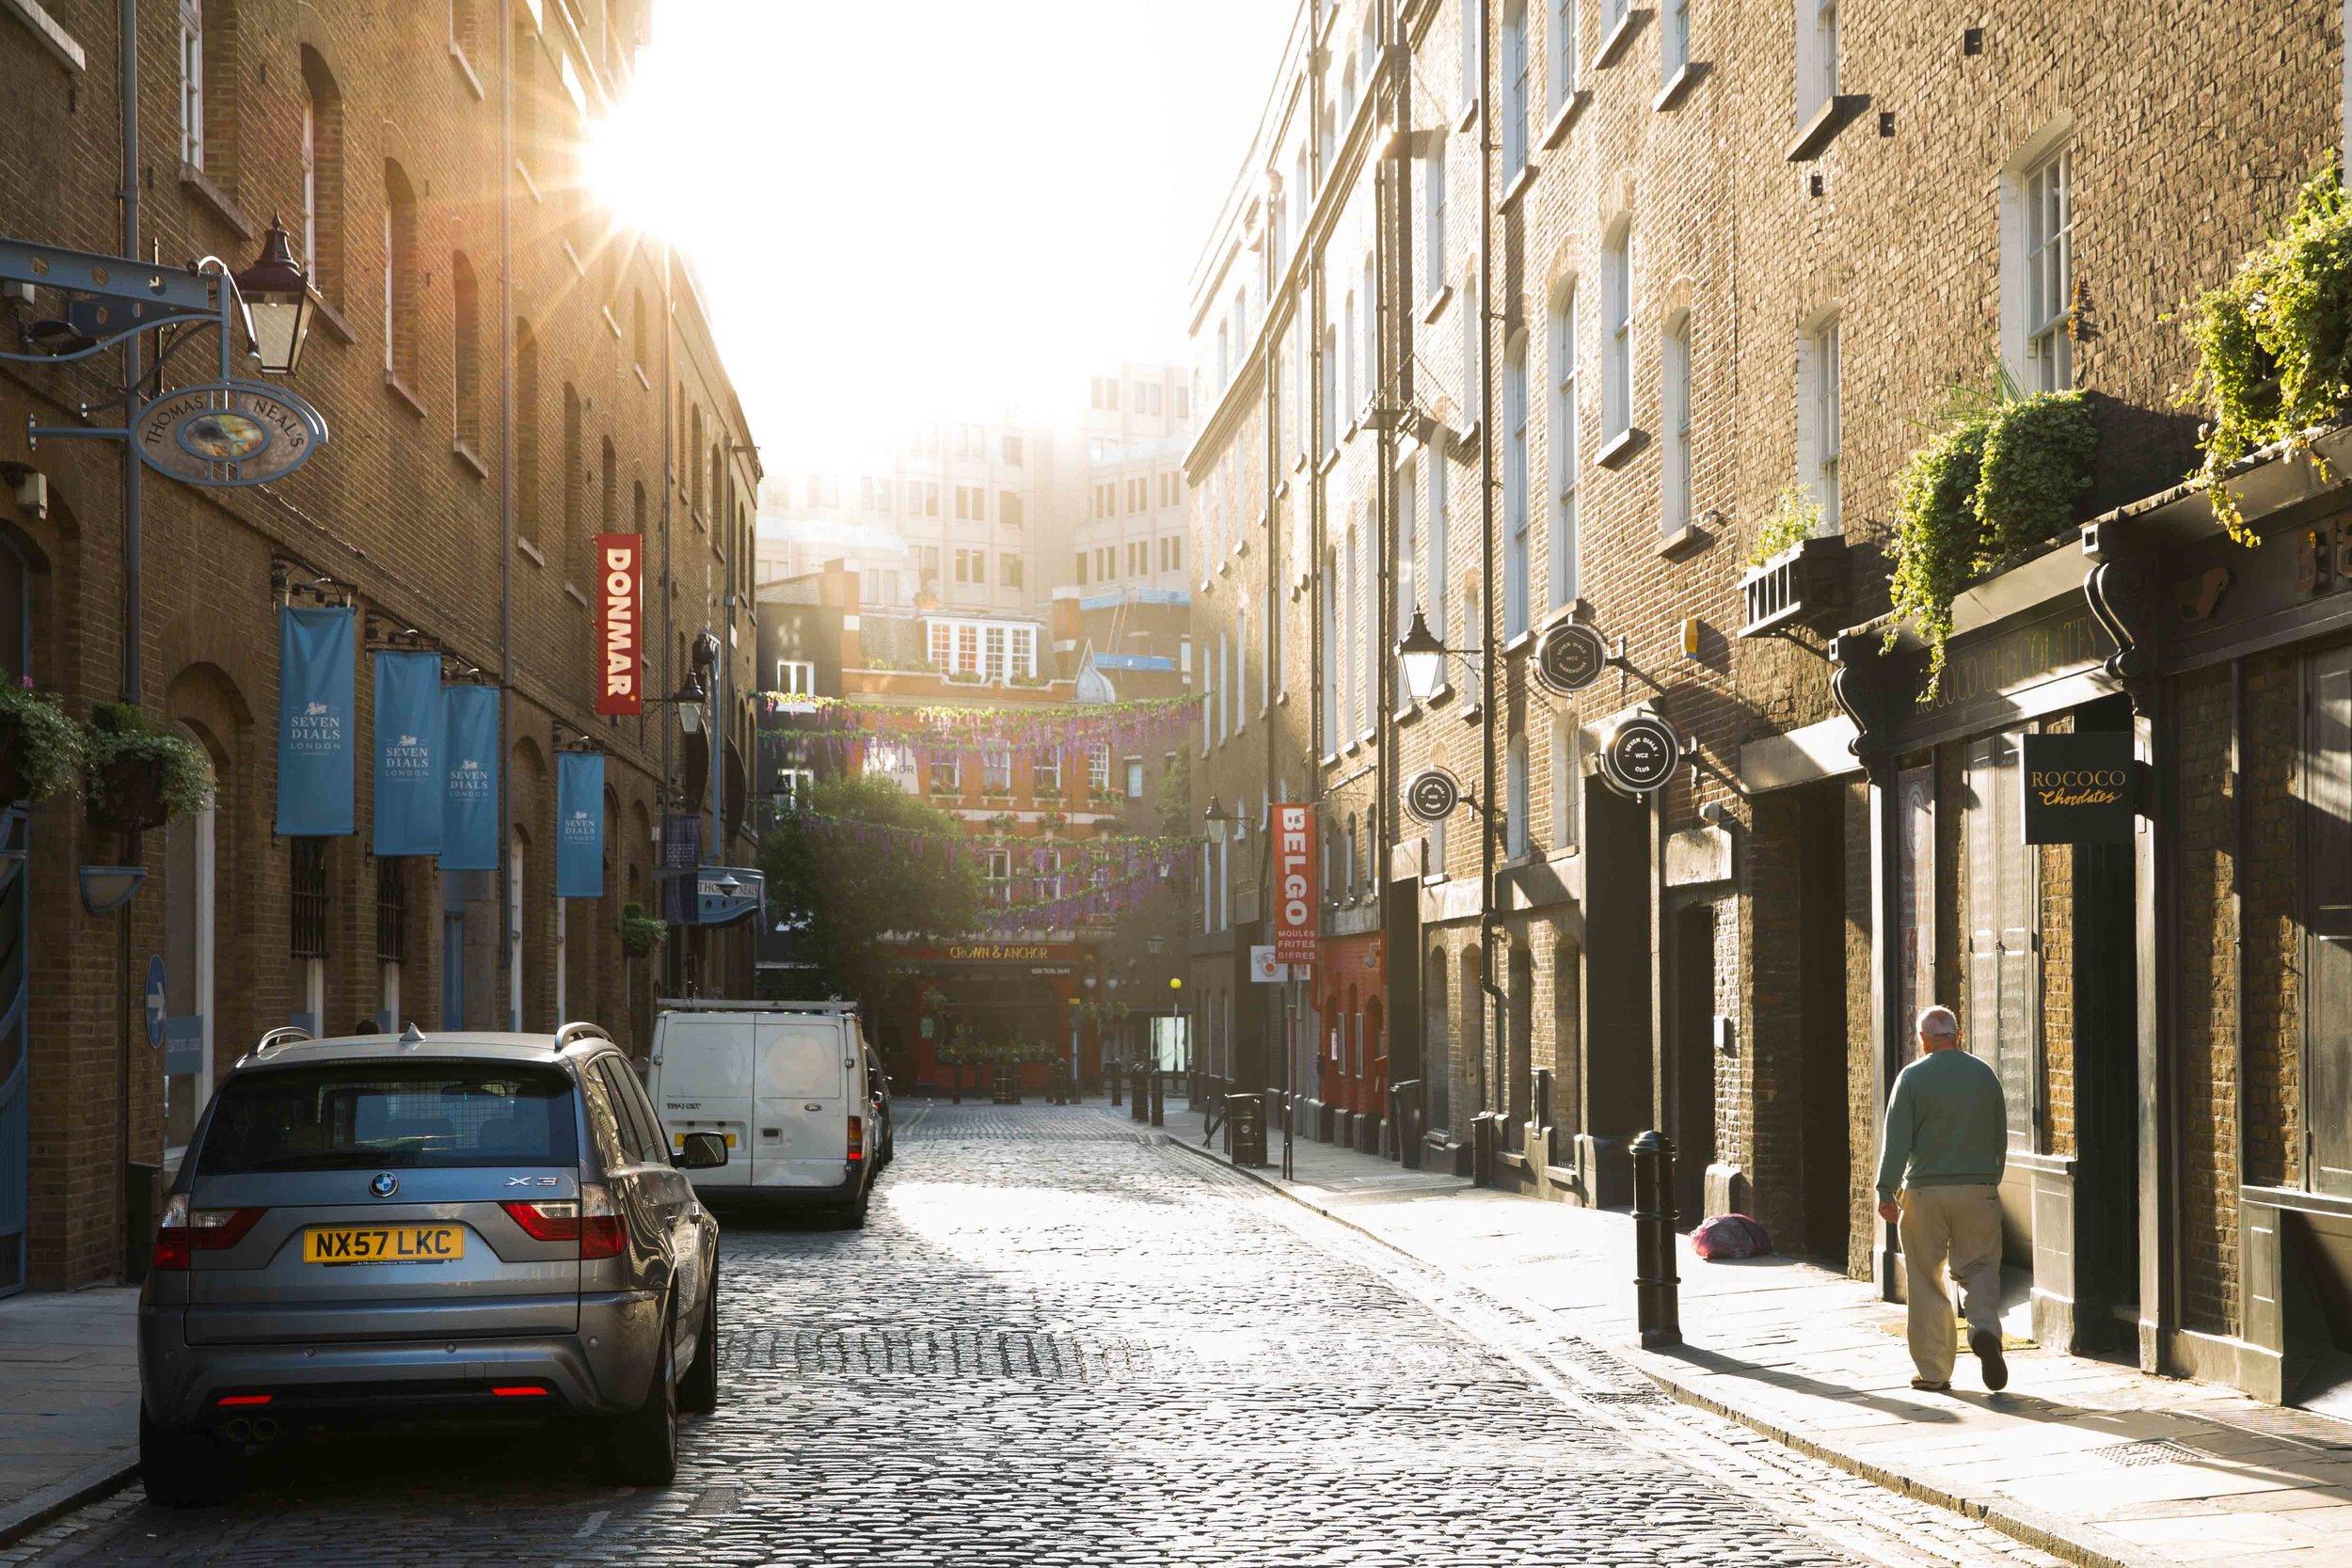 JCTP0104-Covent Garden-London-UK-mcconaghy-5.jpg